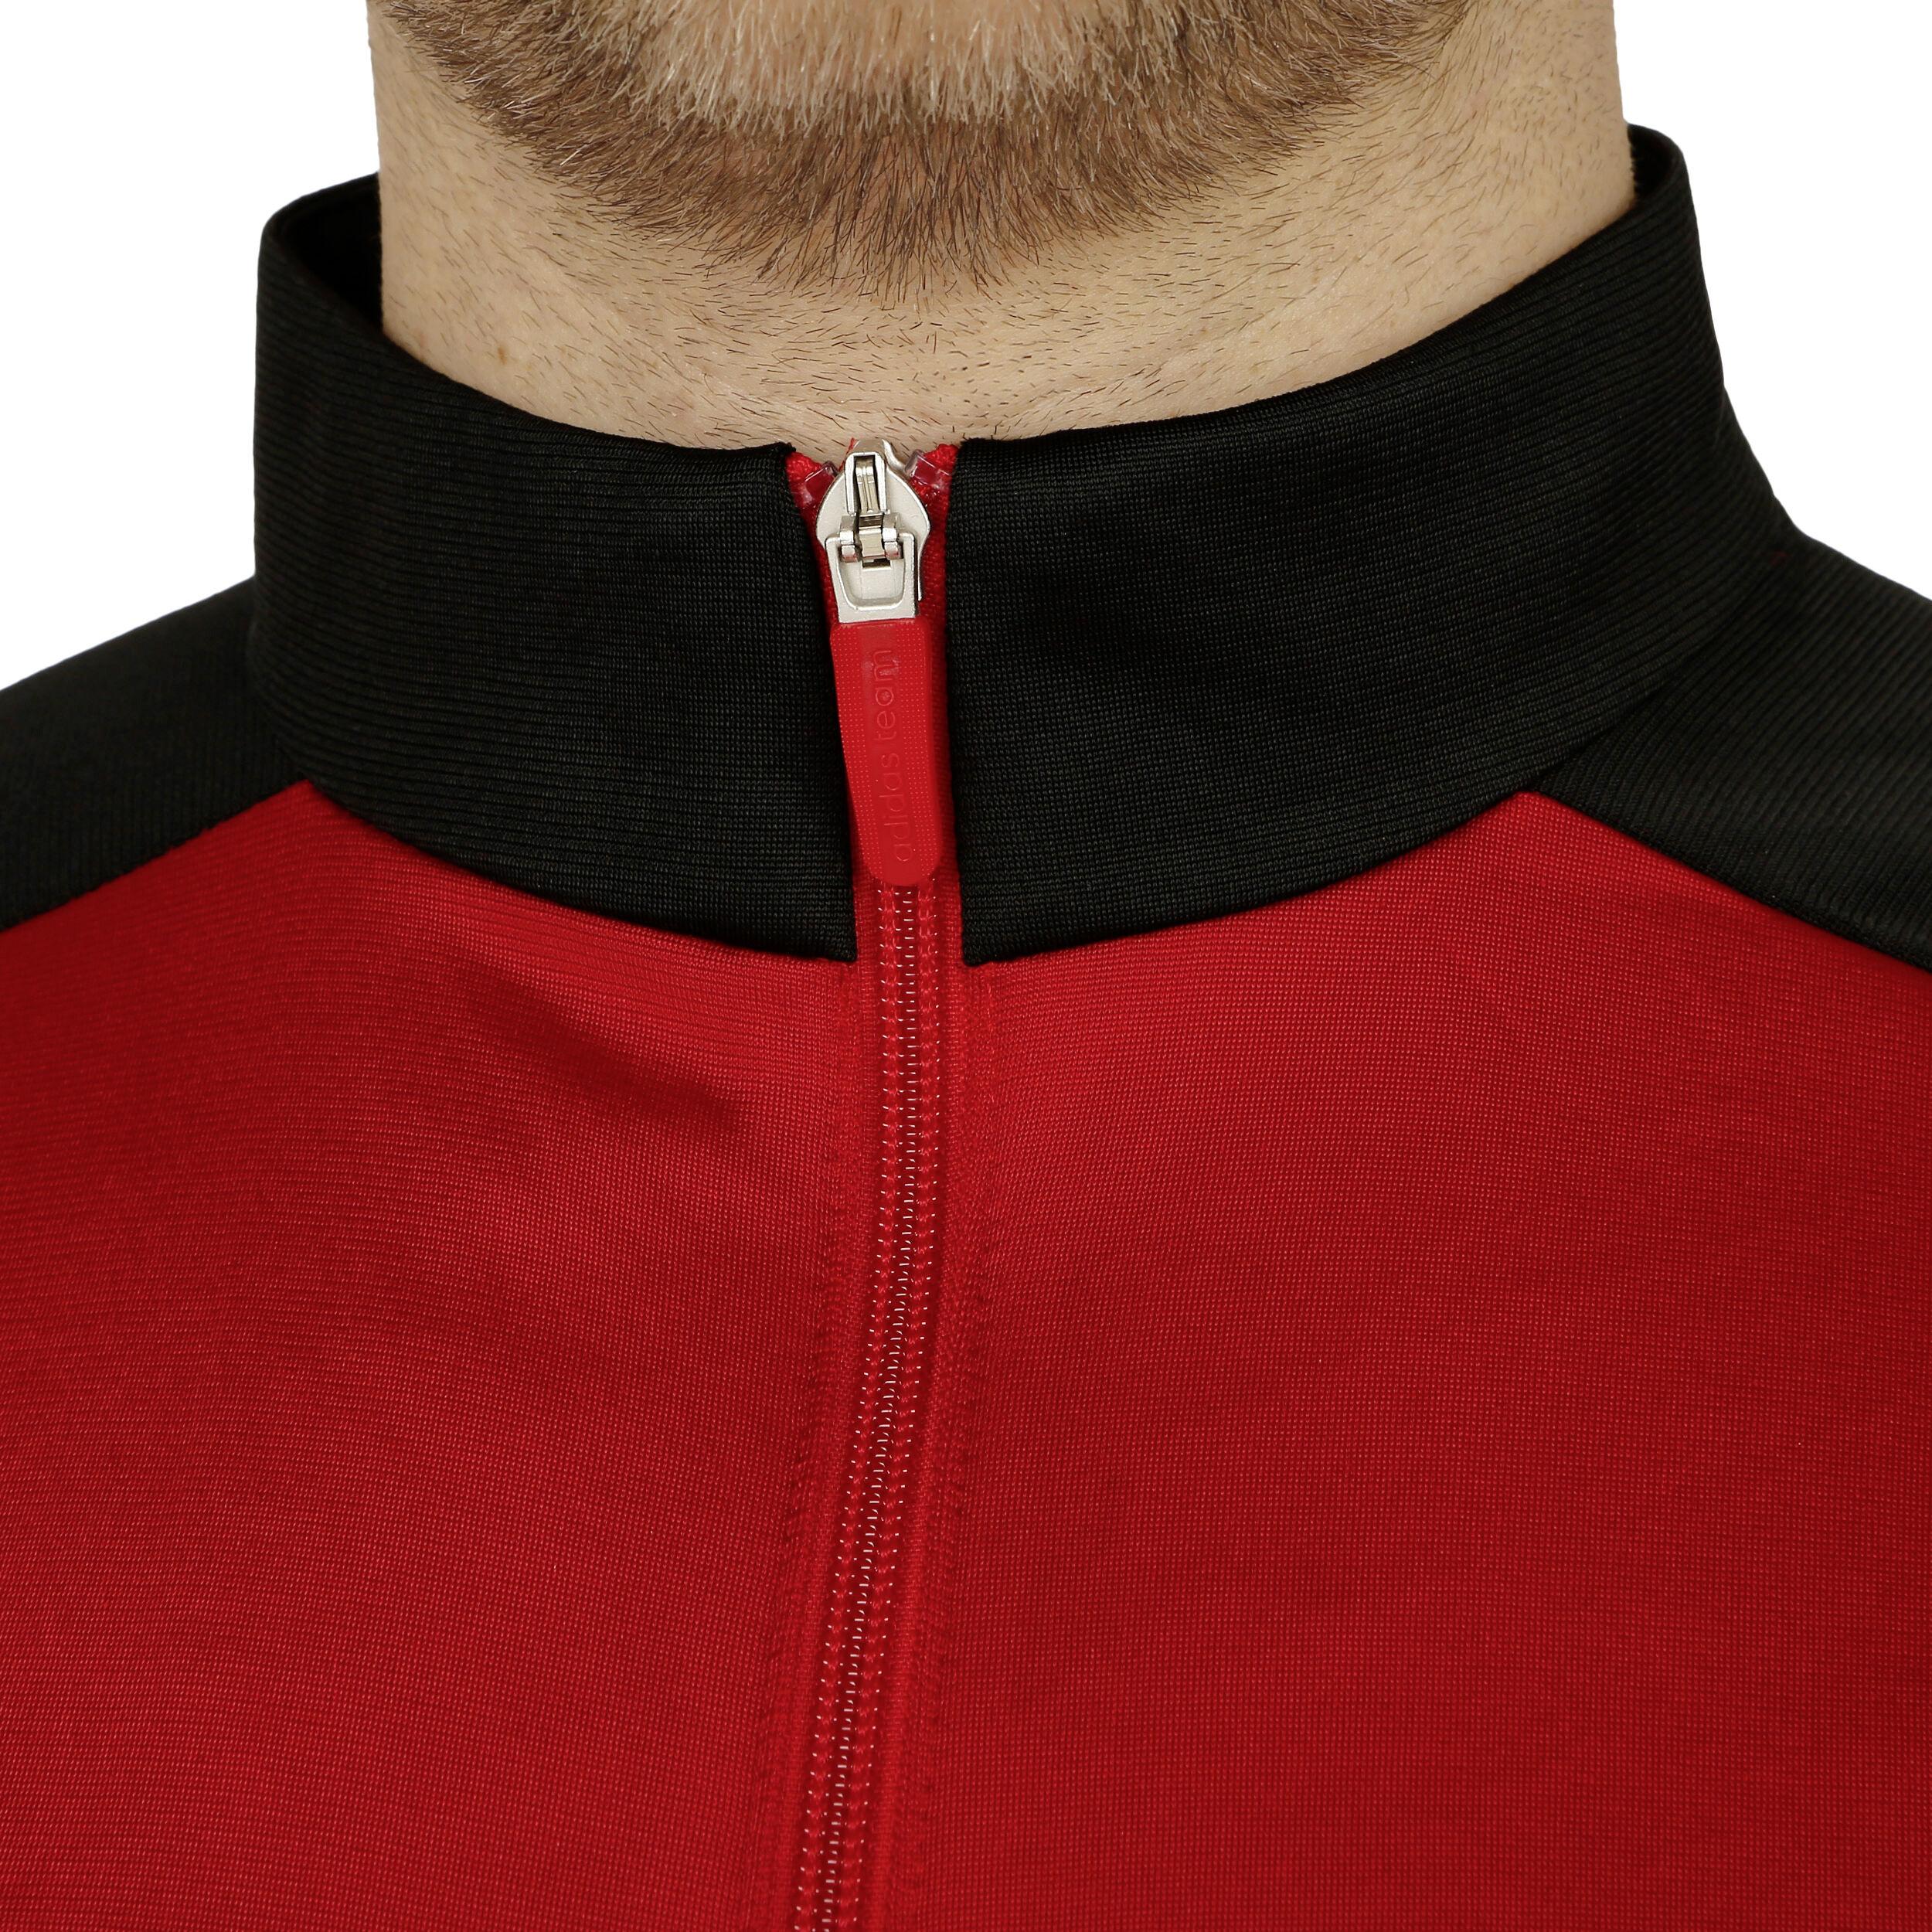 adidas Sereno 14 Trainingsanzug Herren Rot, Schwarz online